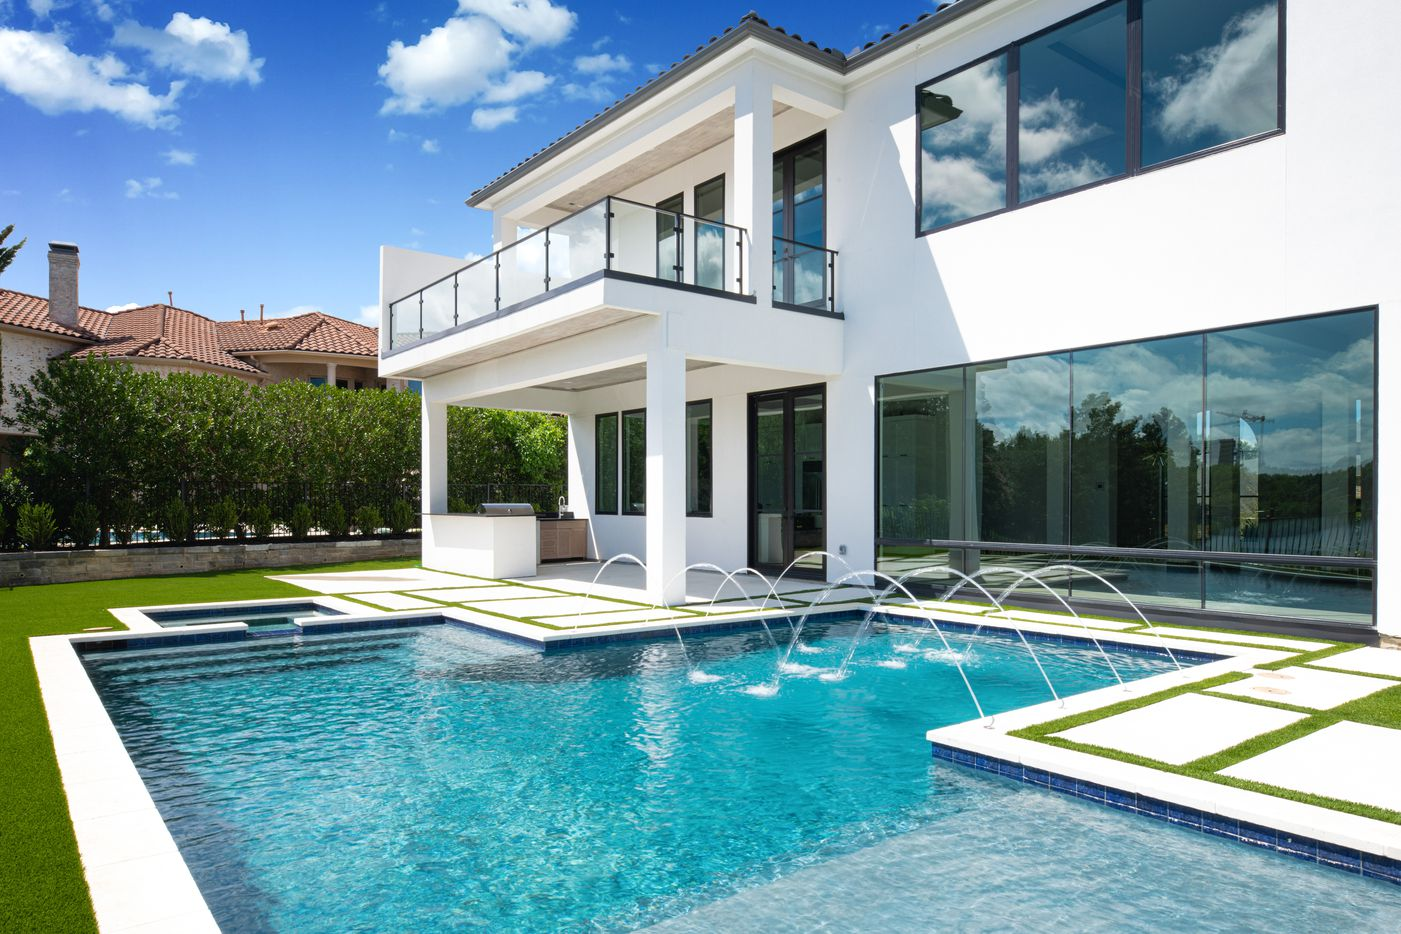 Backyard, pool and patio at 3932 Touraine Drive.